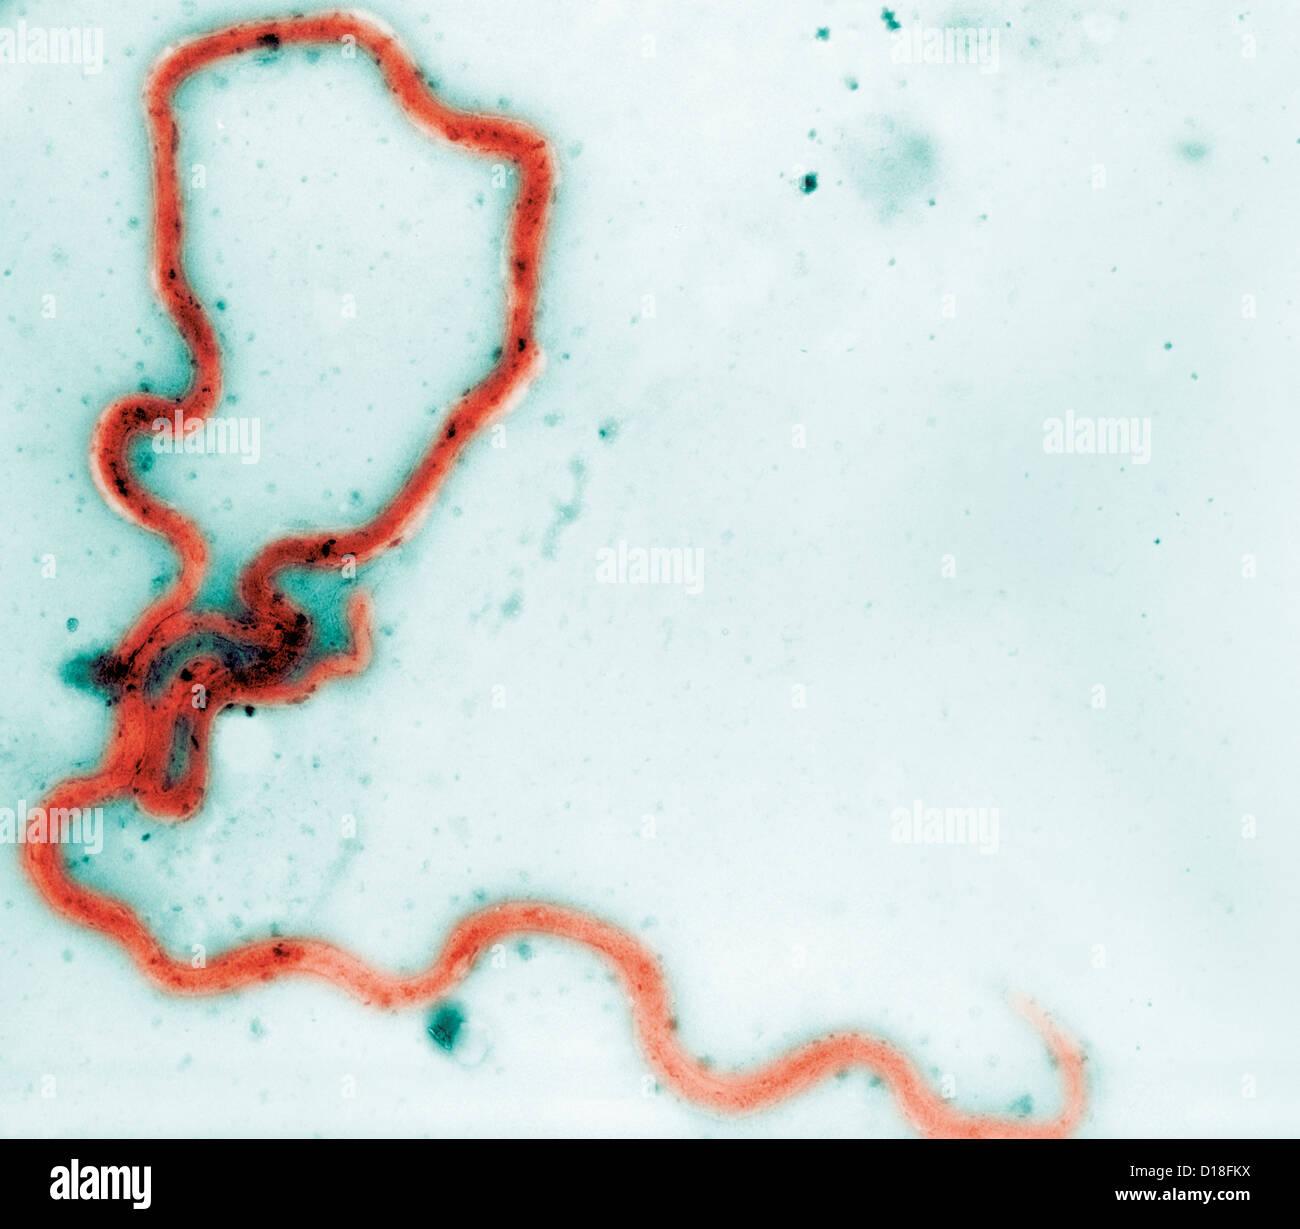 Photomicrograph of Treponema pallidum bacteria - Stock Image